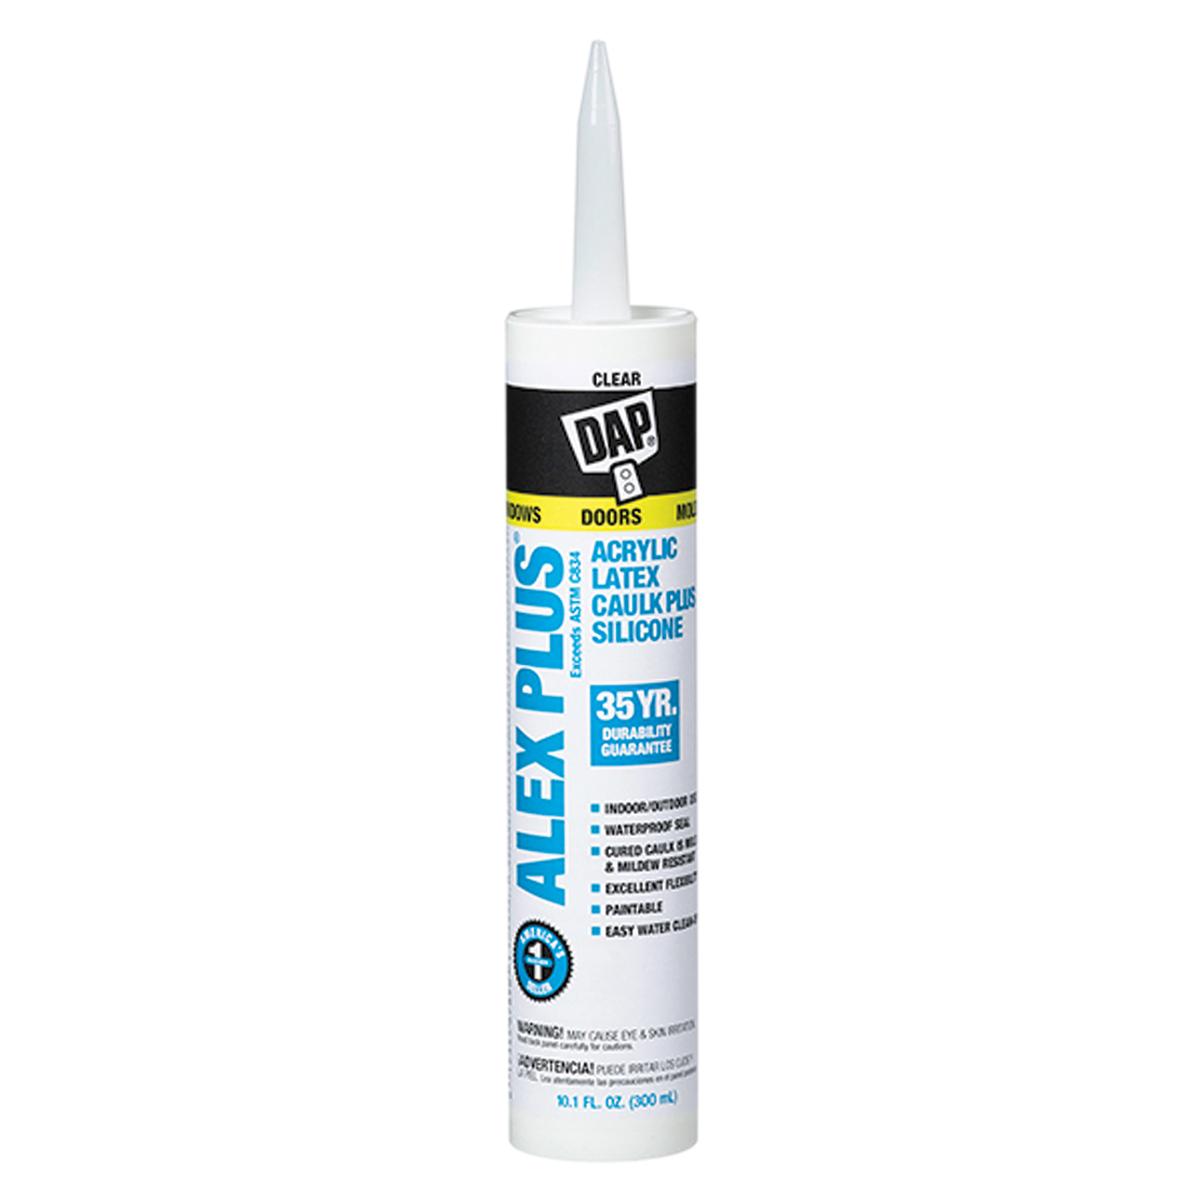 DAP DAP Alex Plus Acrylic Latex Caulk Plus Silicone - Clear 10 oz  - 59158  | Contractor Access